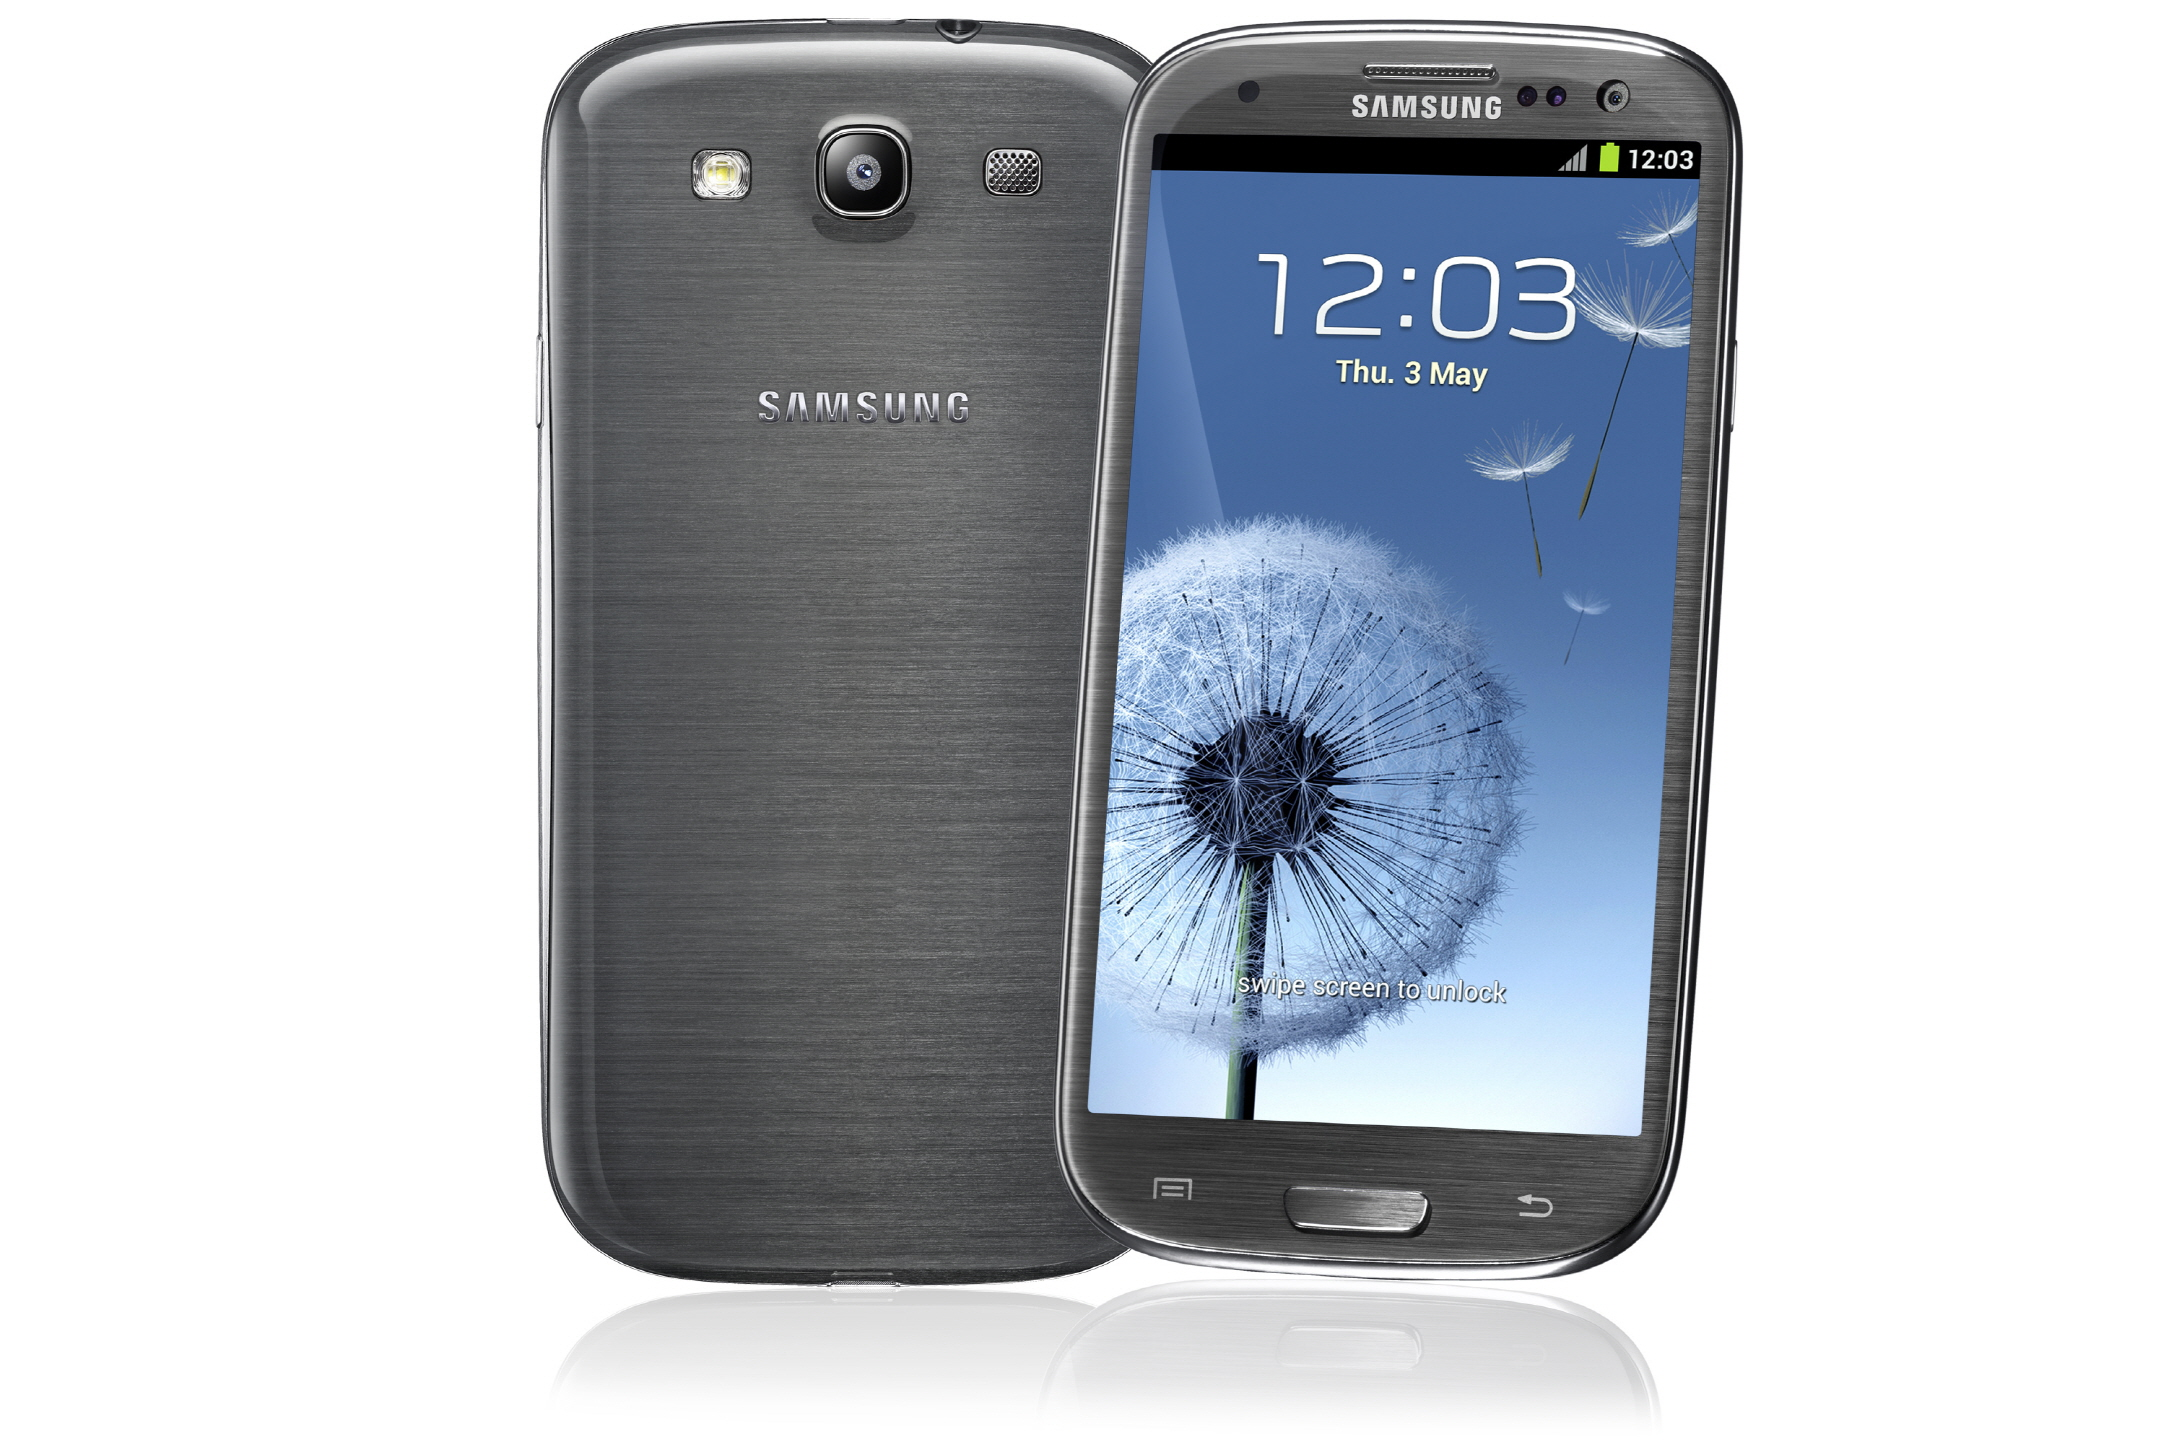 Samsung espera lucro operacional de US$ 7,28 bi